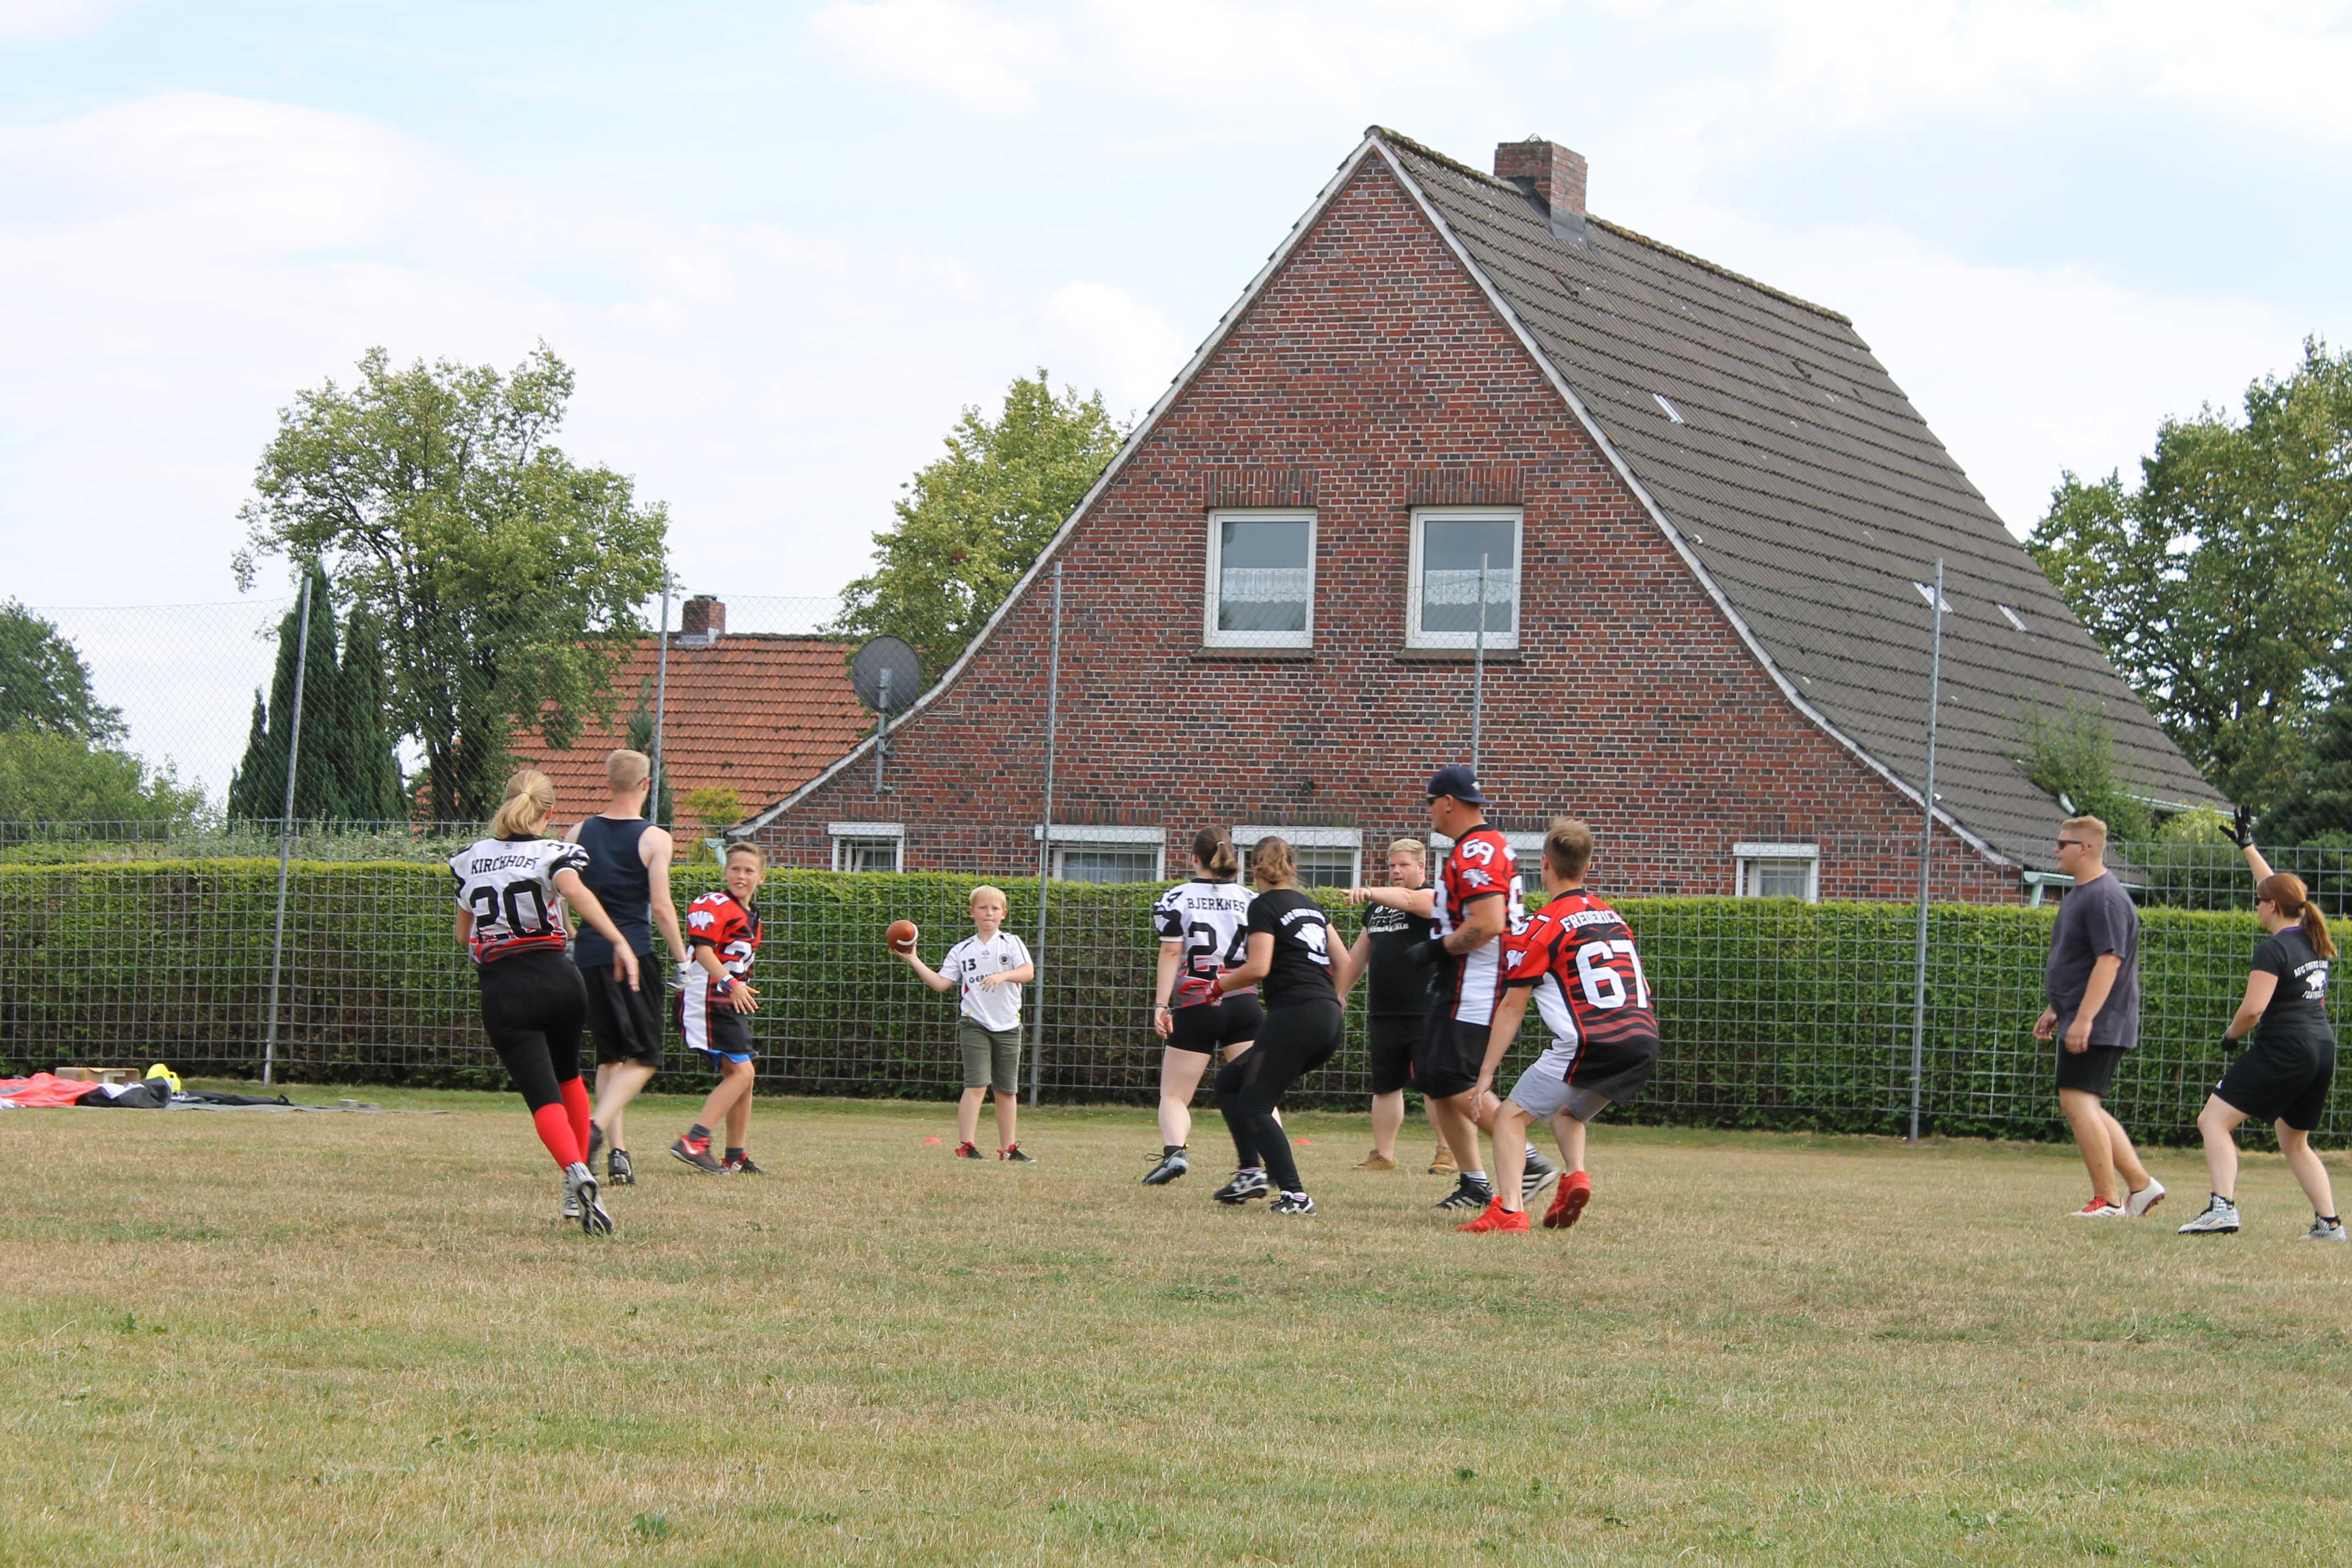 2018-07-29 Sportwoche - Sportpicknick & Football & Fußball (50)